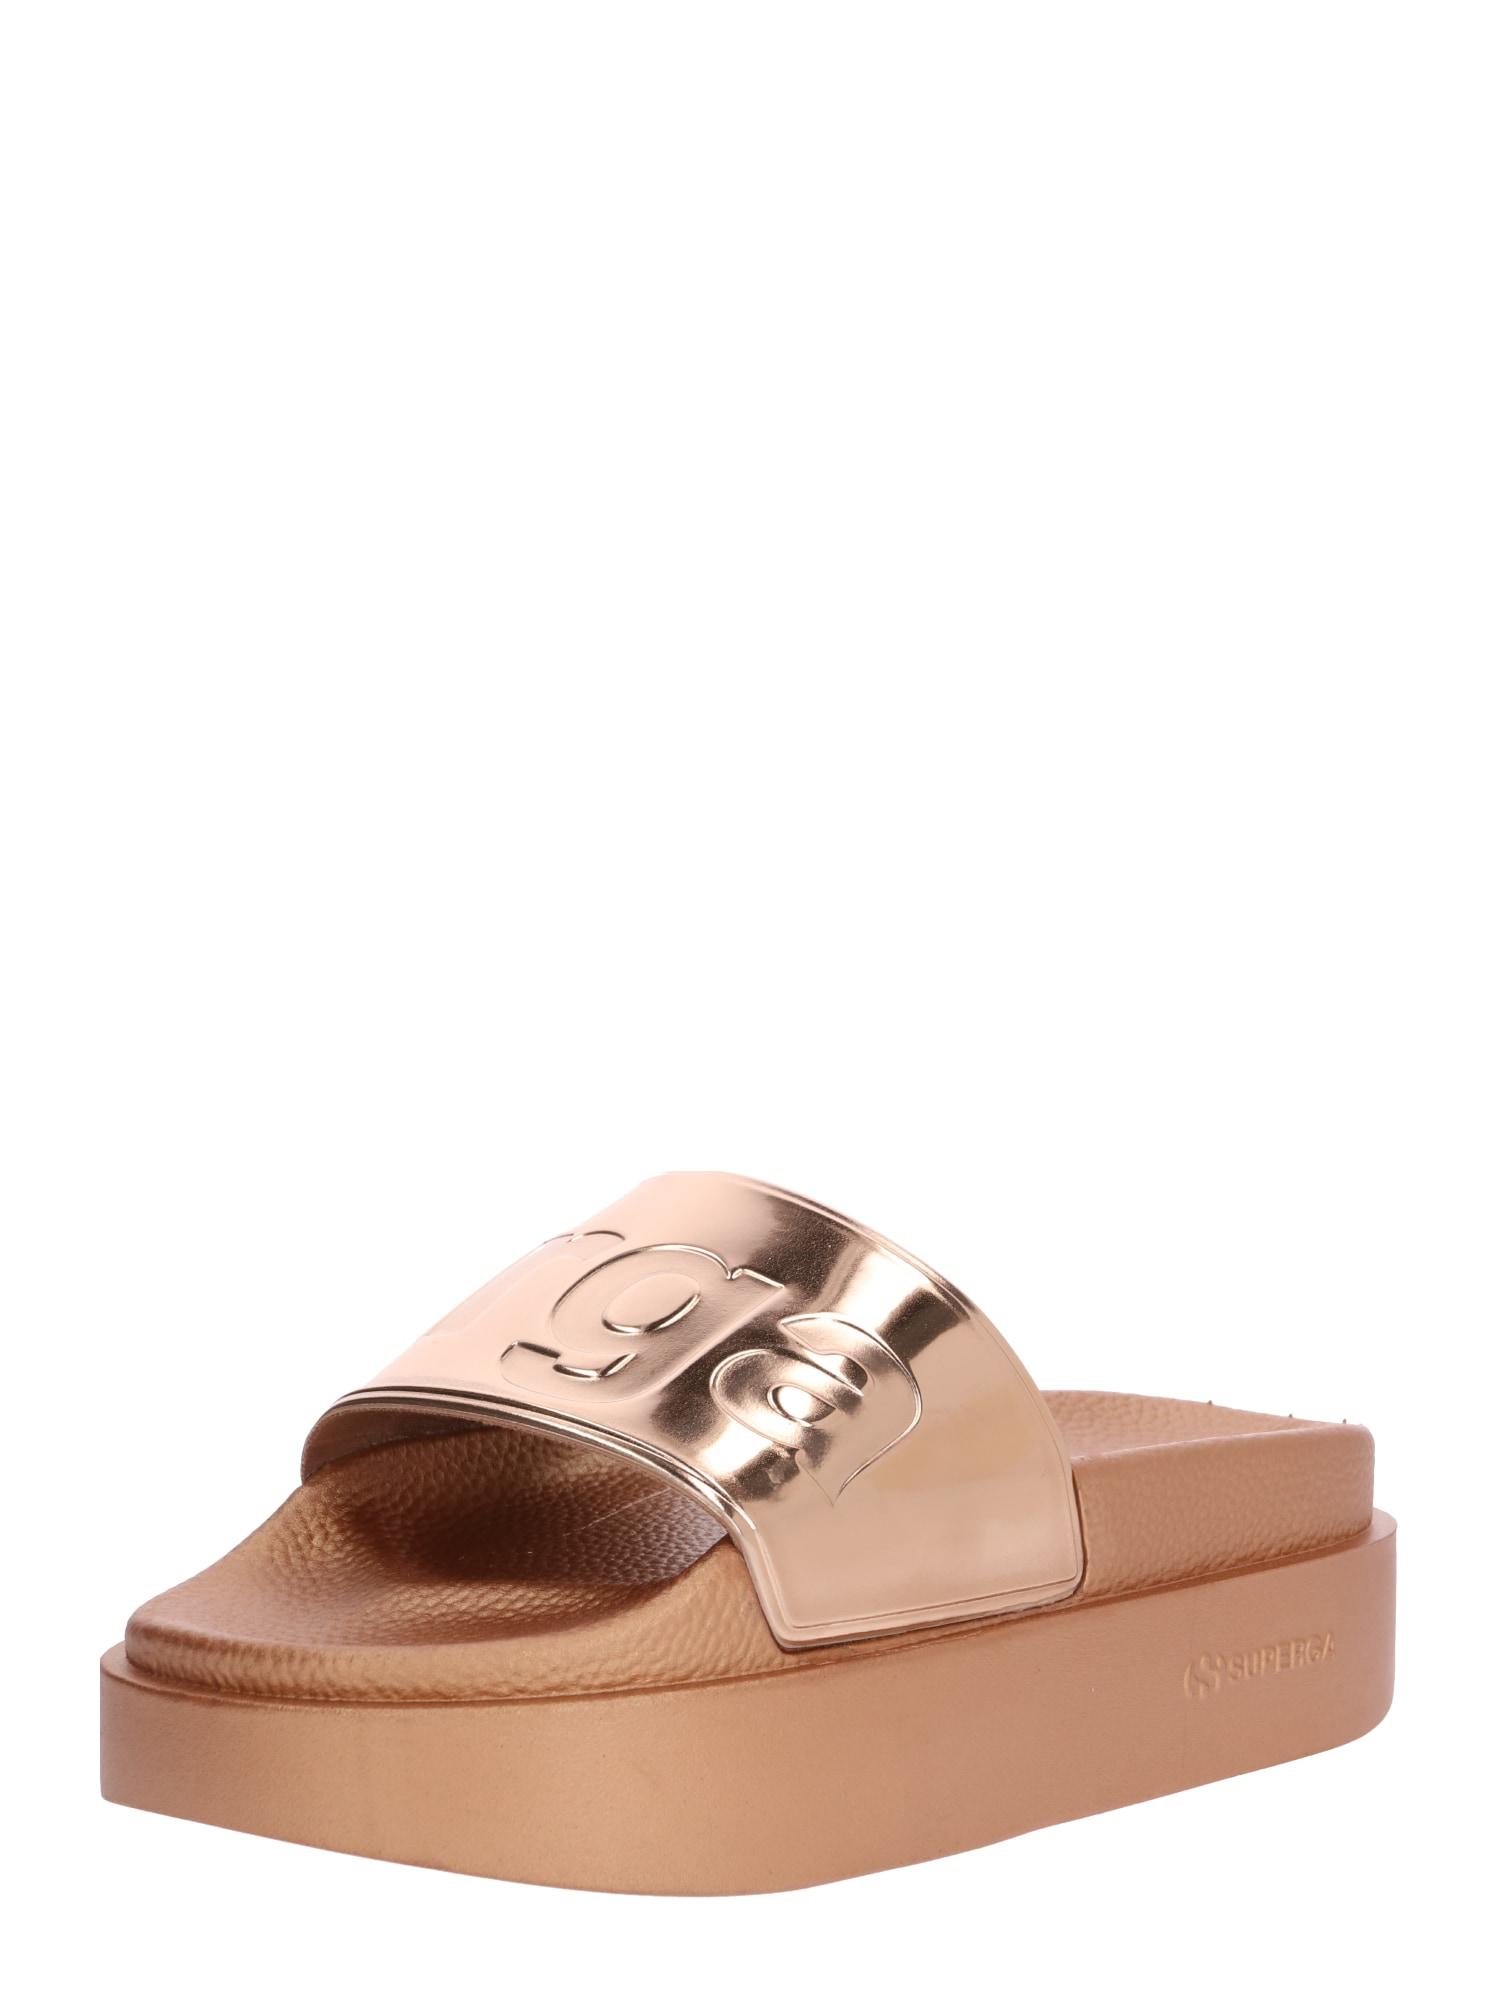 Pantofle 1919 zlatá růžově zlatá SUPERGA